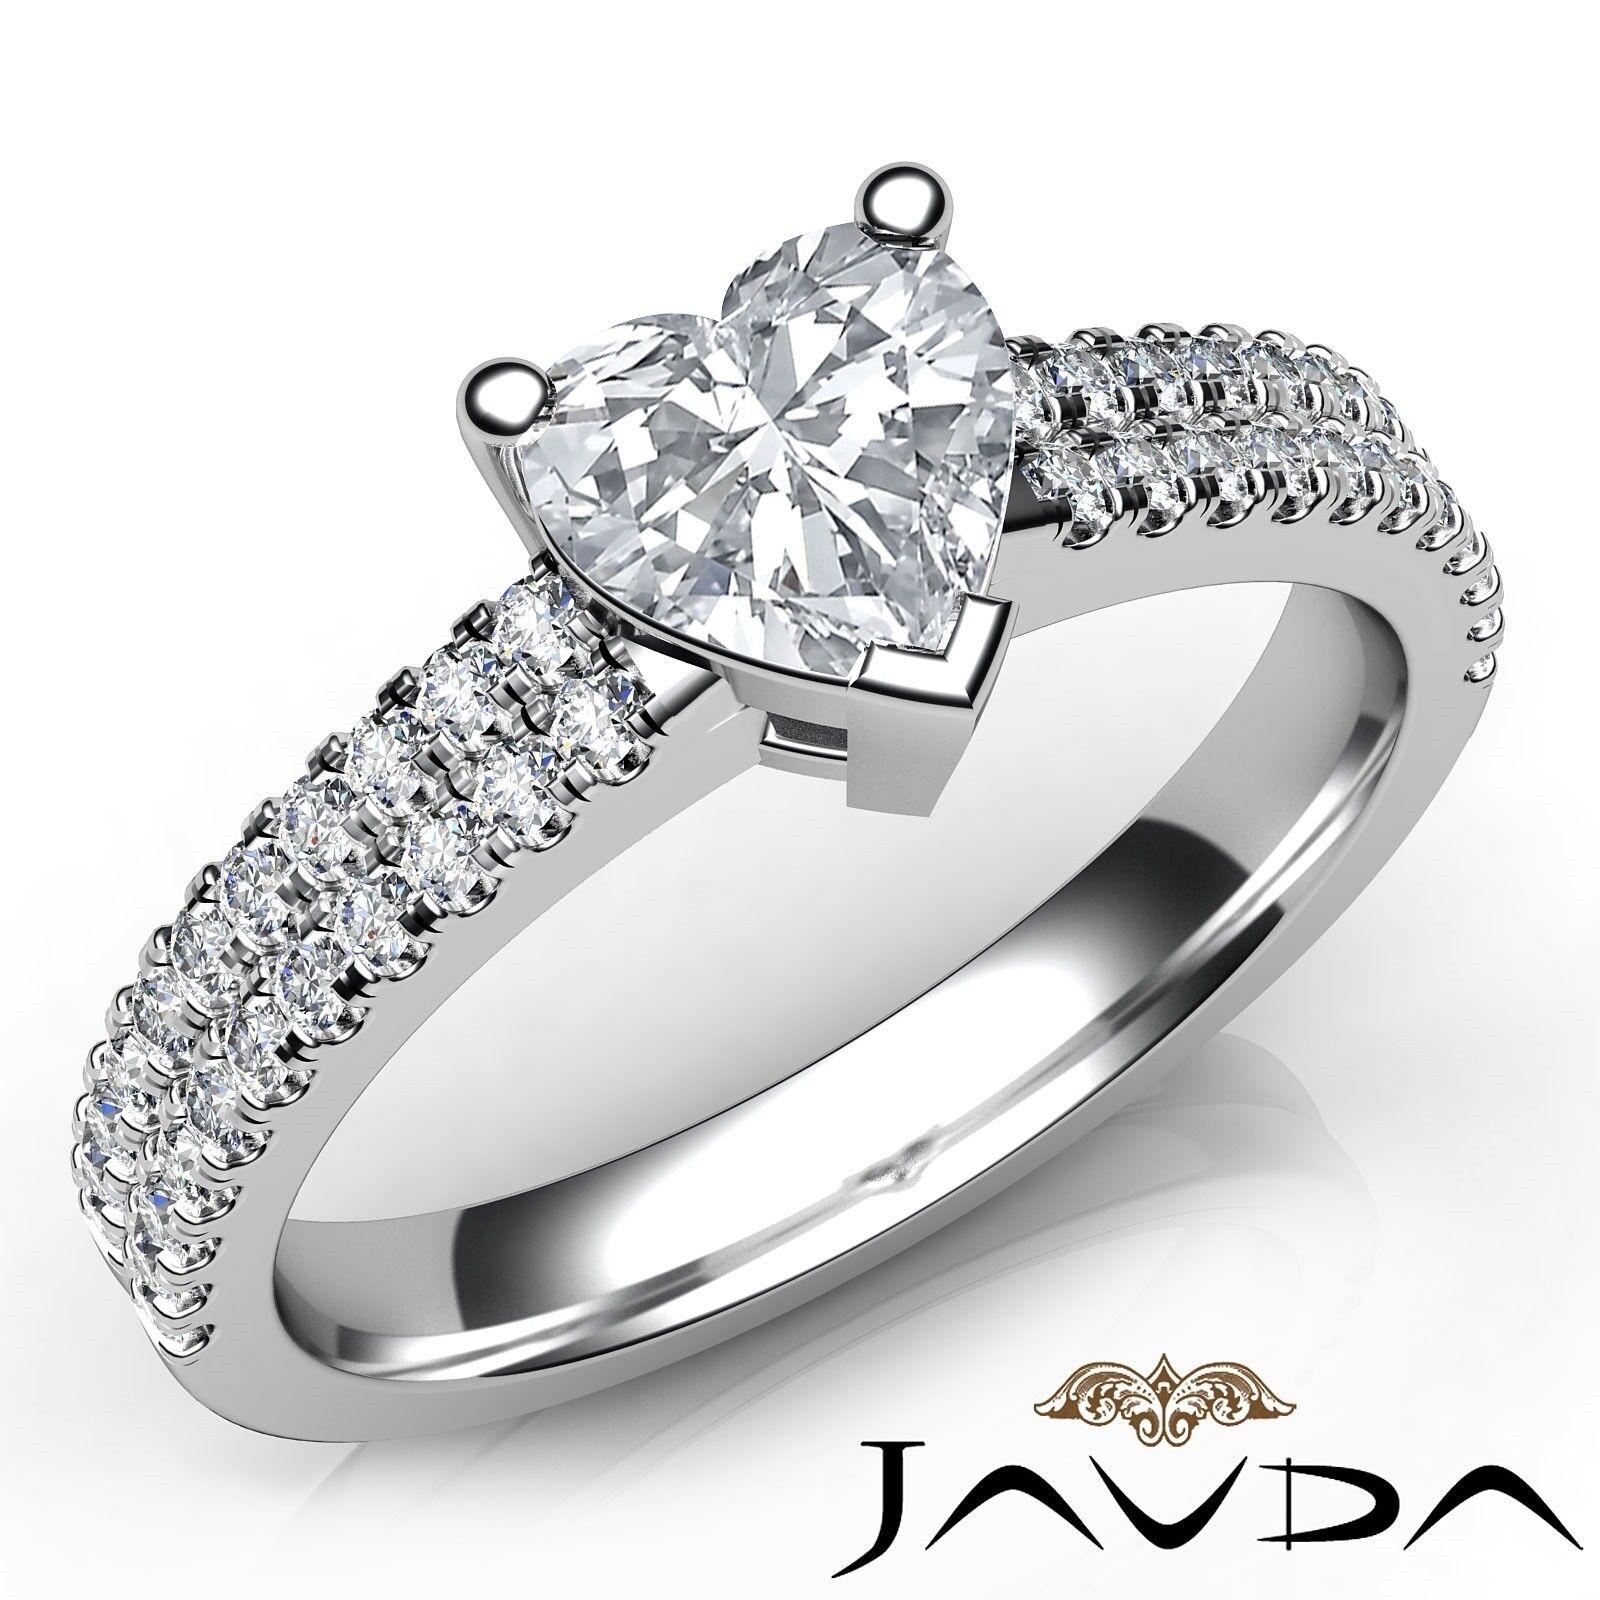 1.5ctw 2 Row Shank Sidestone Heart Diamond Engagement Ring GIA I-VS2 White Gold